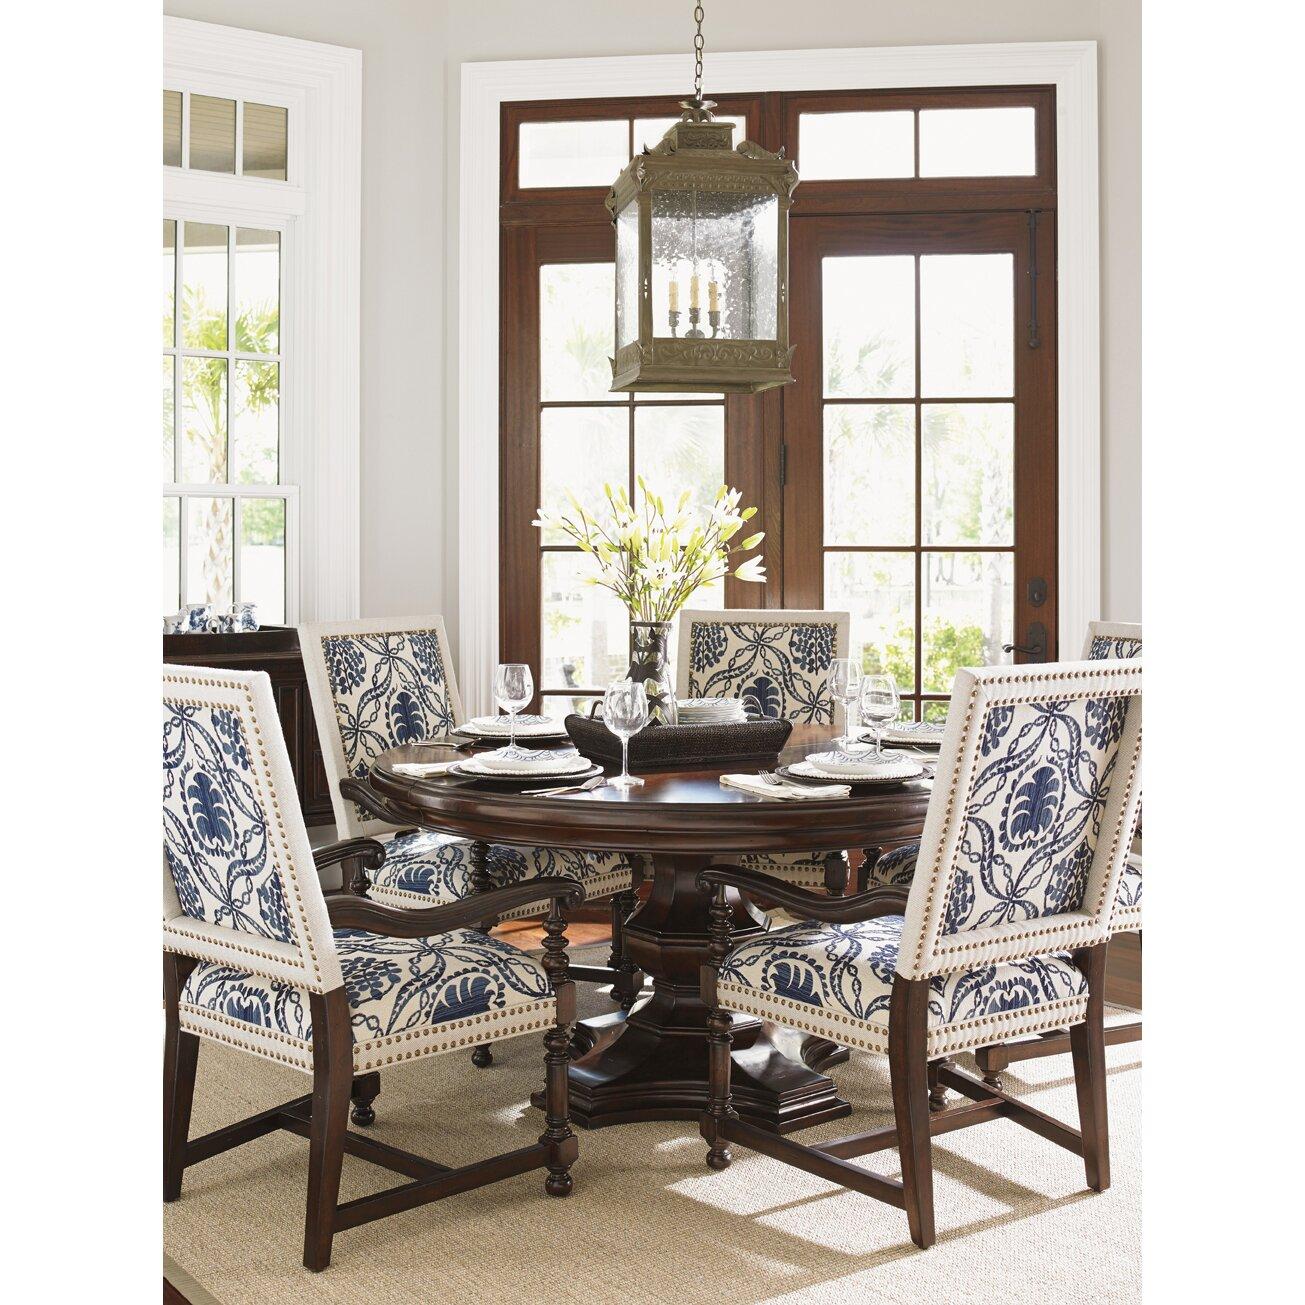 lexington dining room table   Lexington Kilimanjaro Extendable Dining Table Set   Wayfair